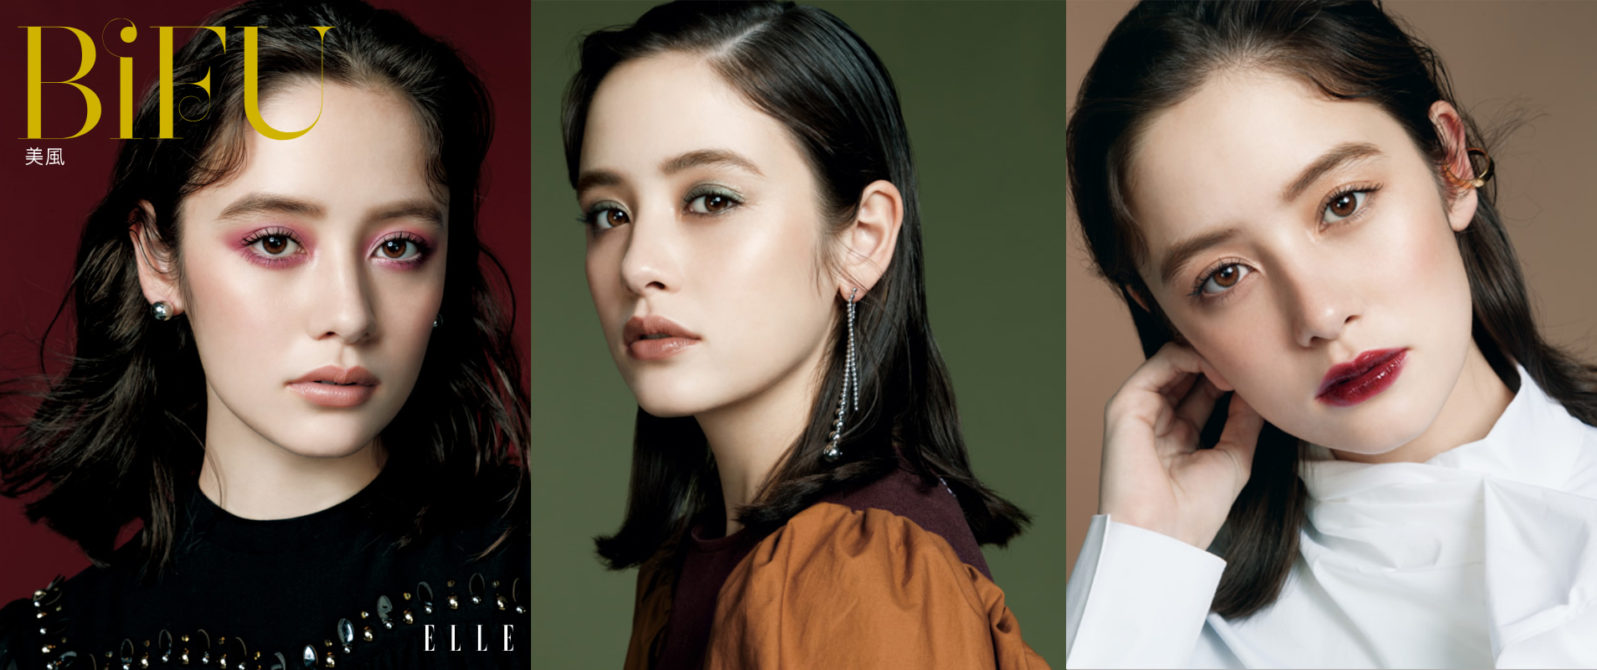 TAKASHIMAYA Cosmetic Magazine _美風 BiFU_ 2020 秋